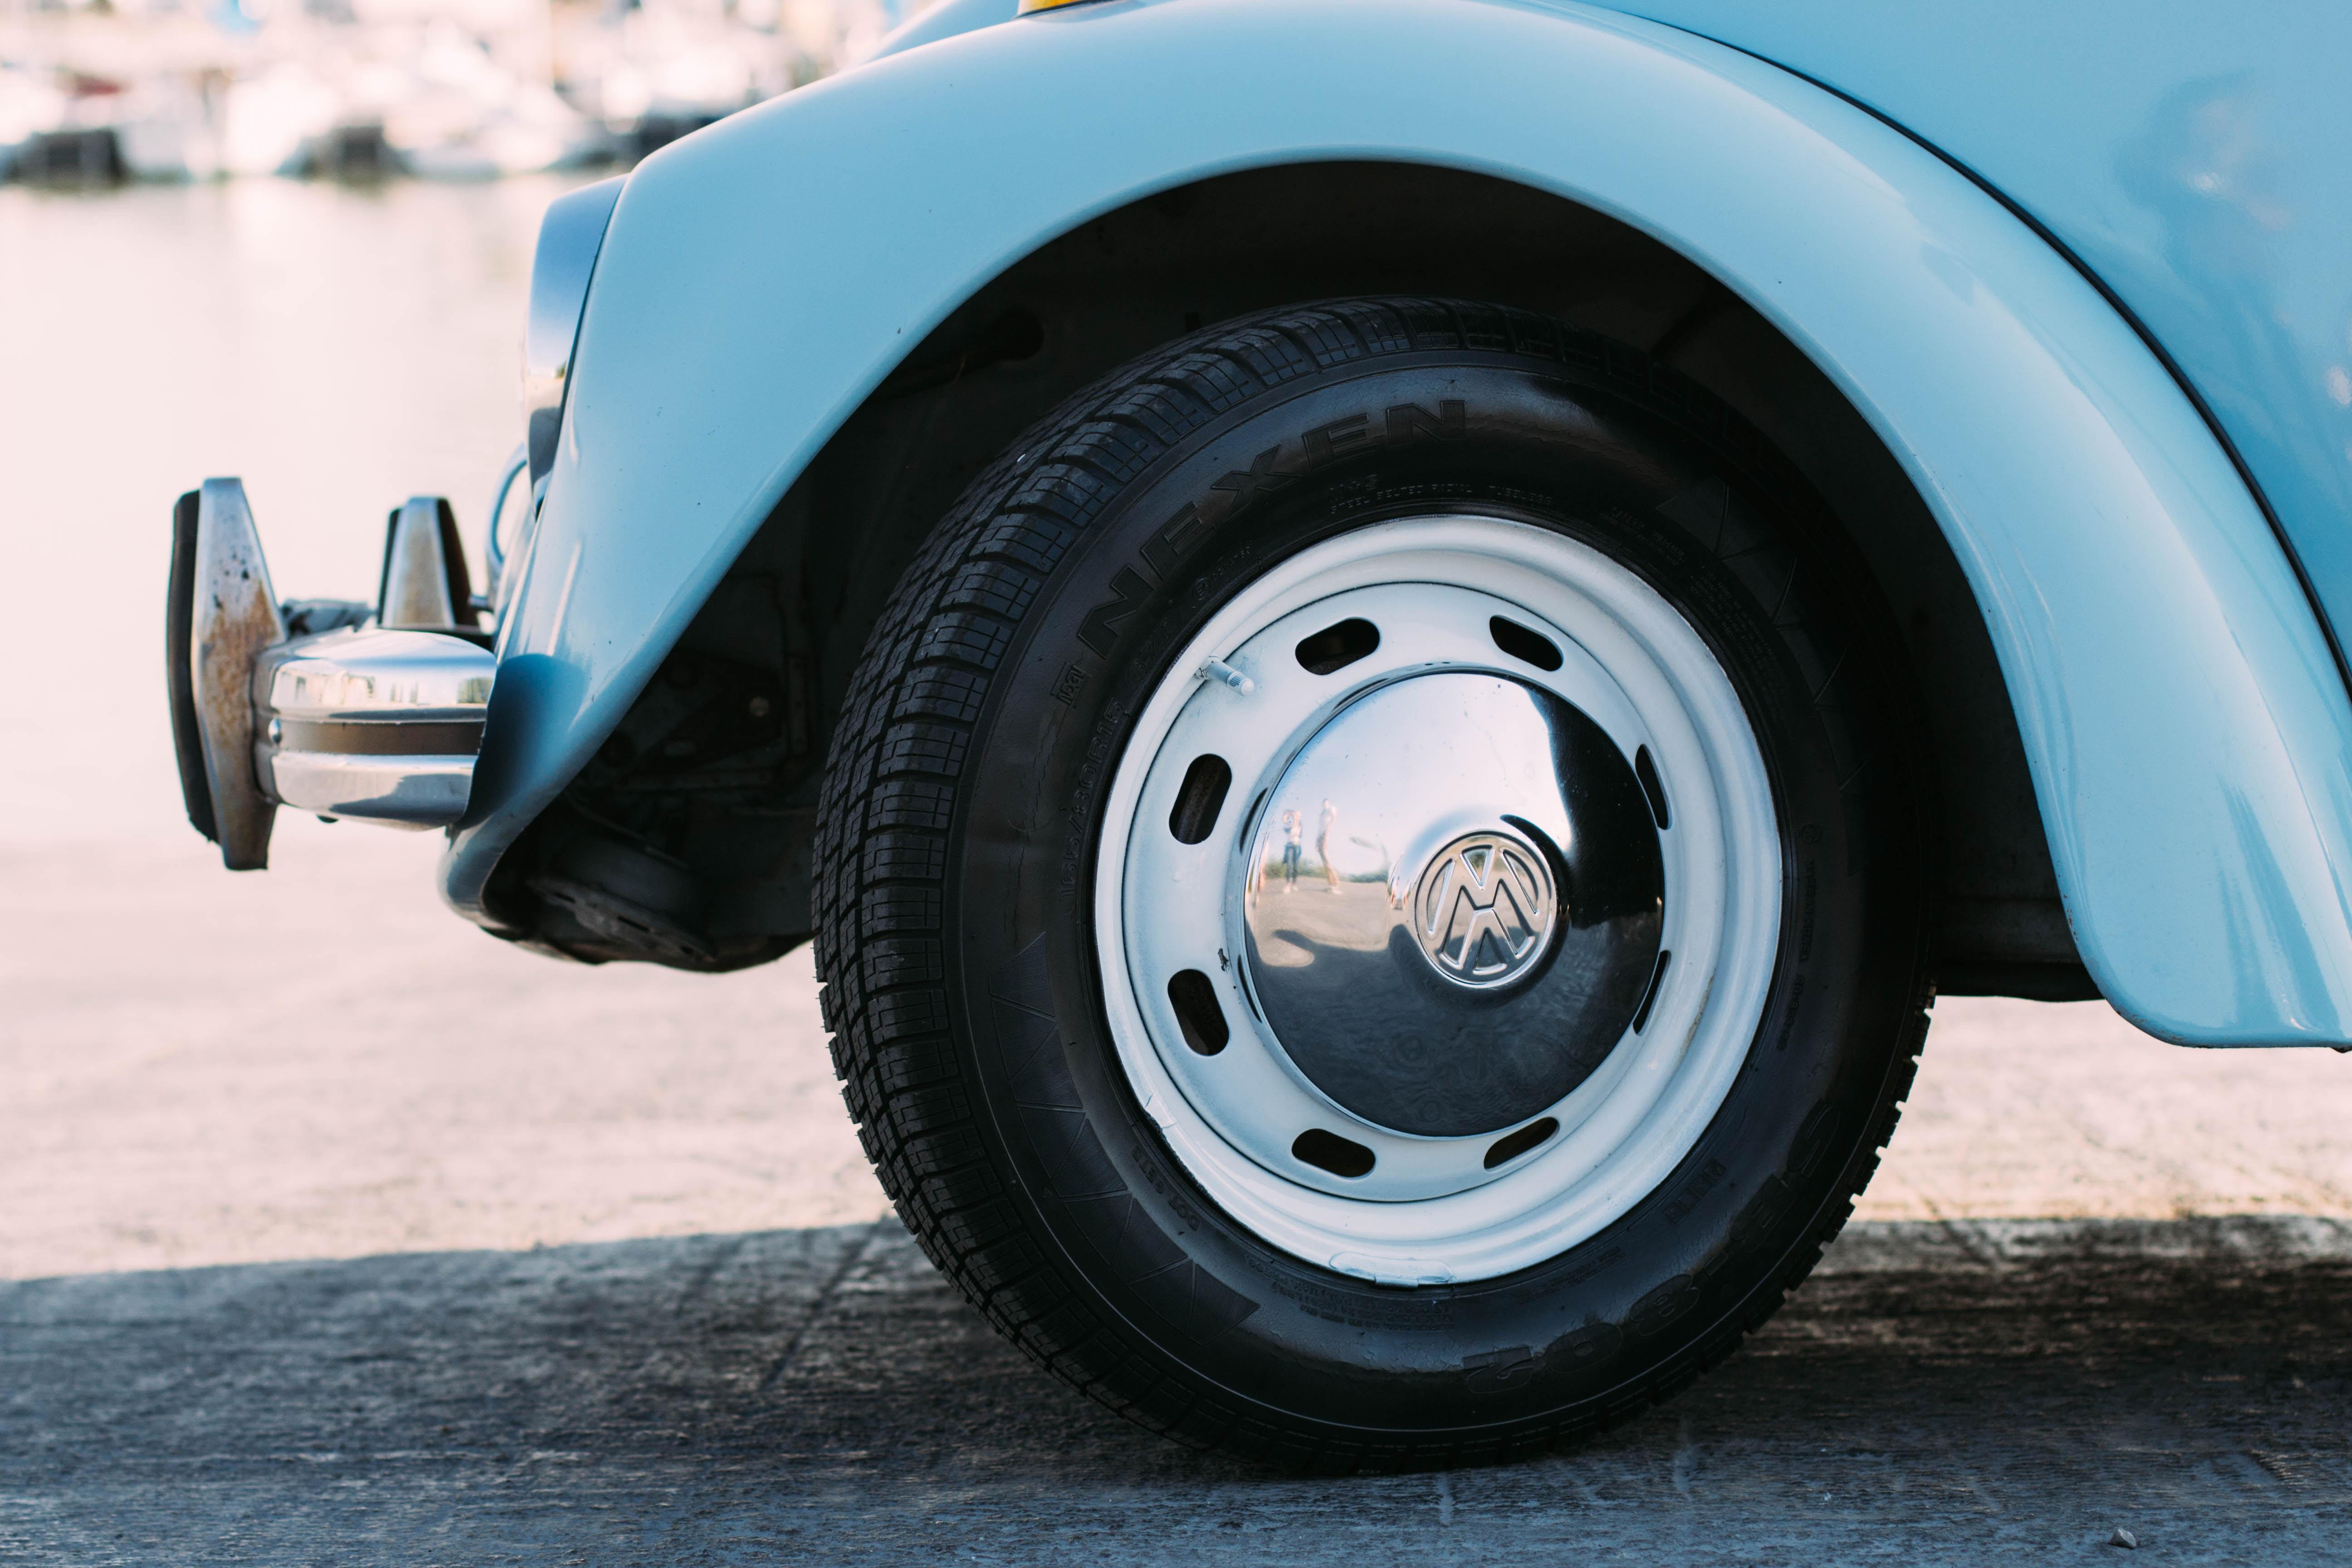 VW - Sell My VW